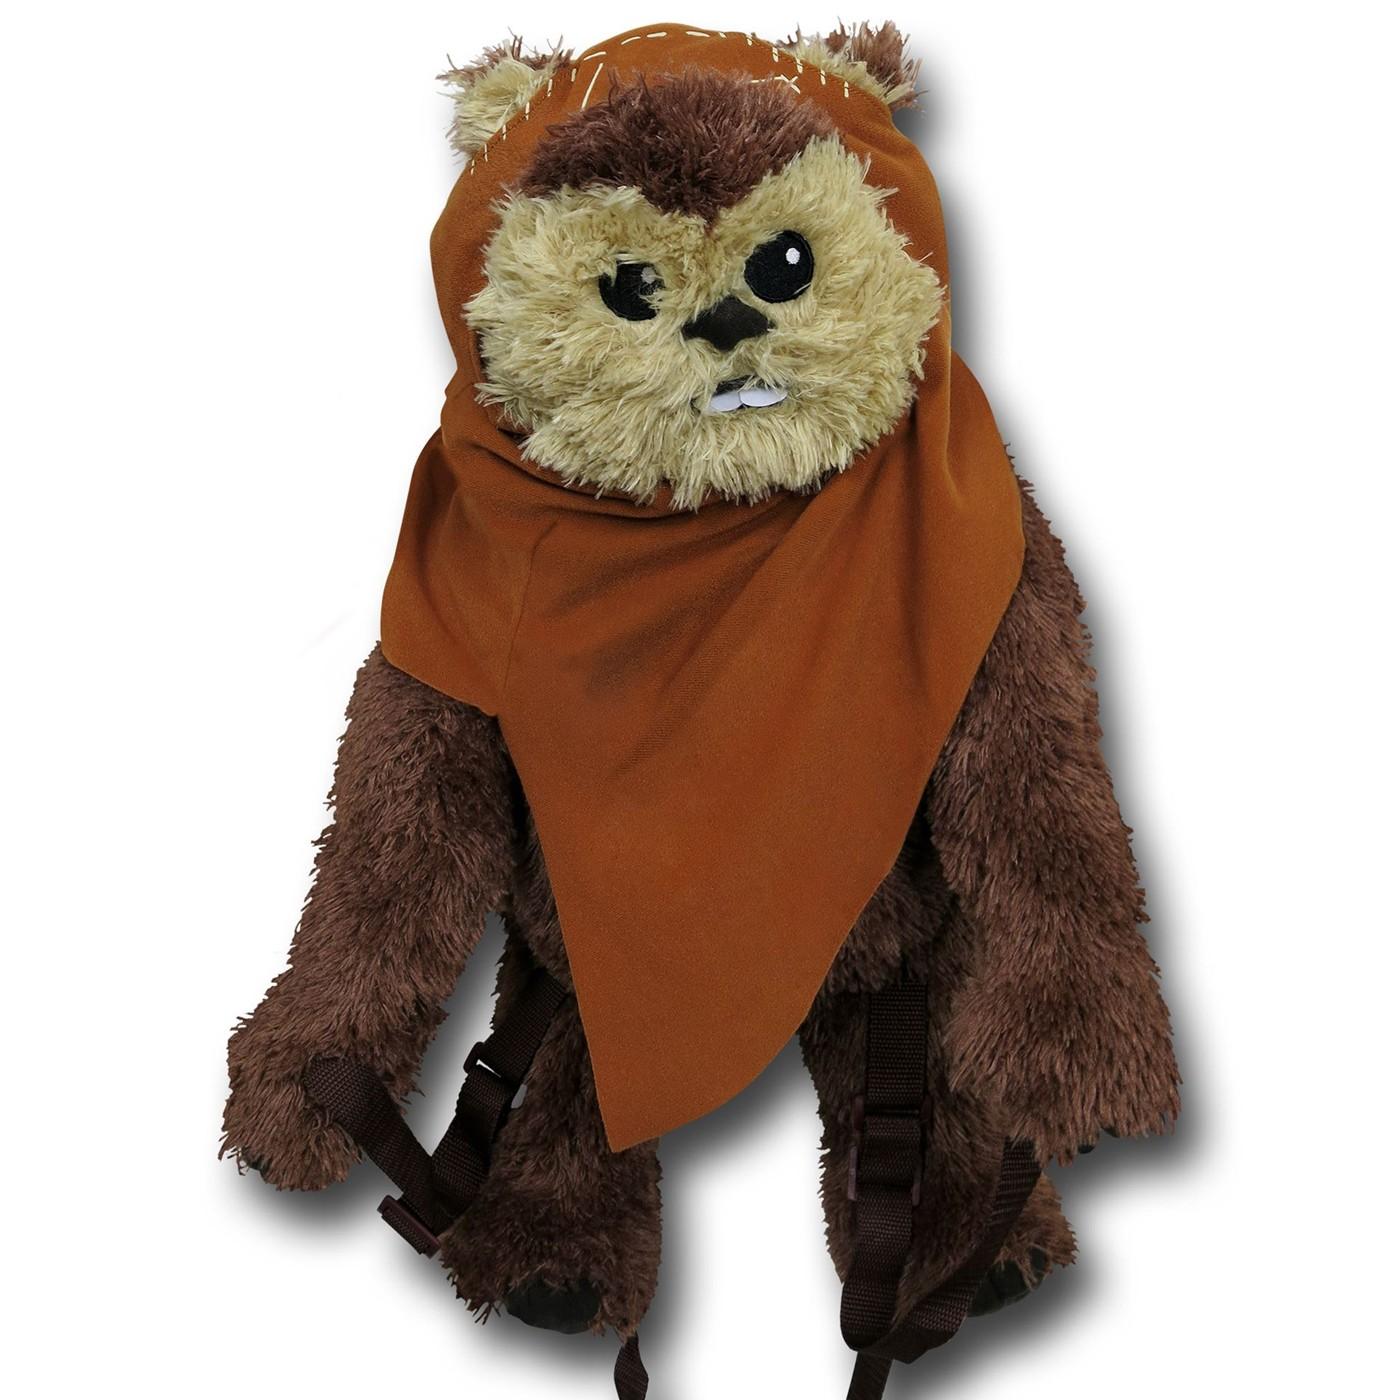 Star Wars Wicket The Ewok Backpack Buddy